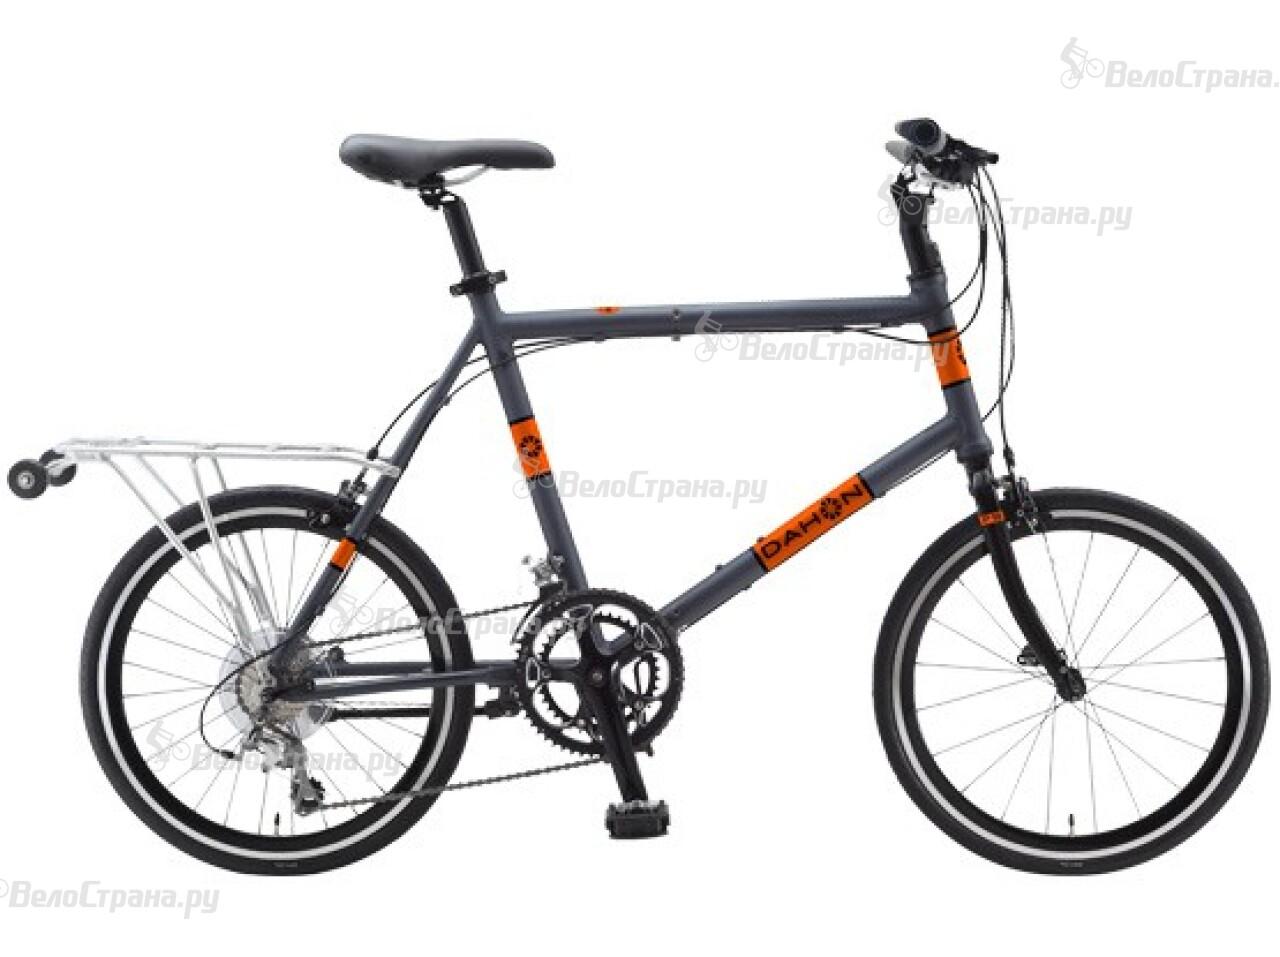 Велосипед Dahon Dash D18 (2015) велосипед dahon mariner d7 2015